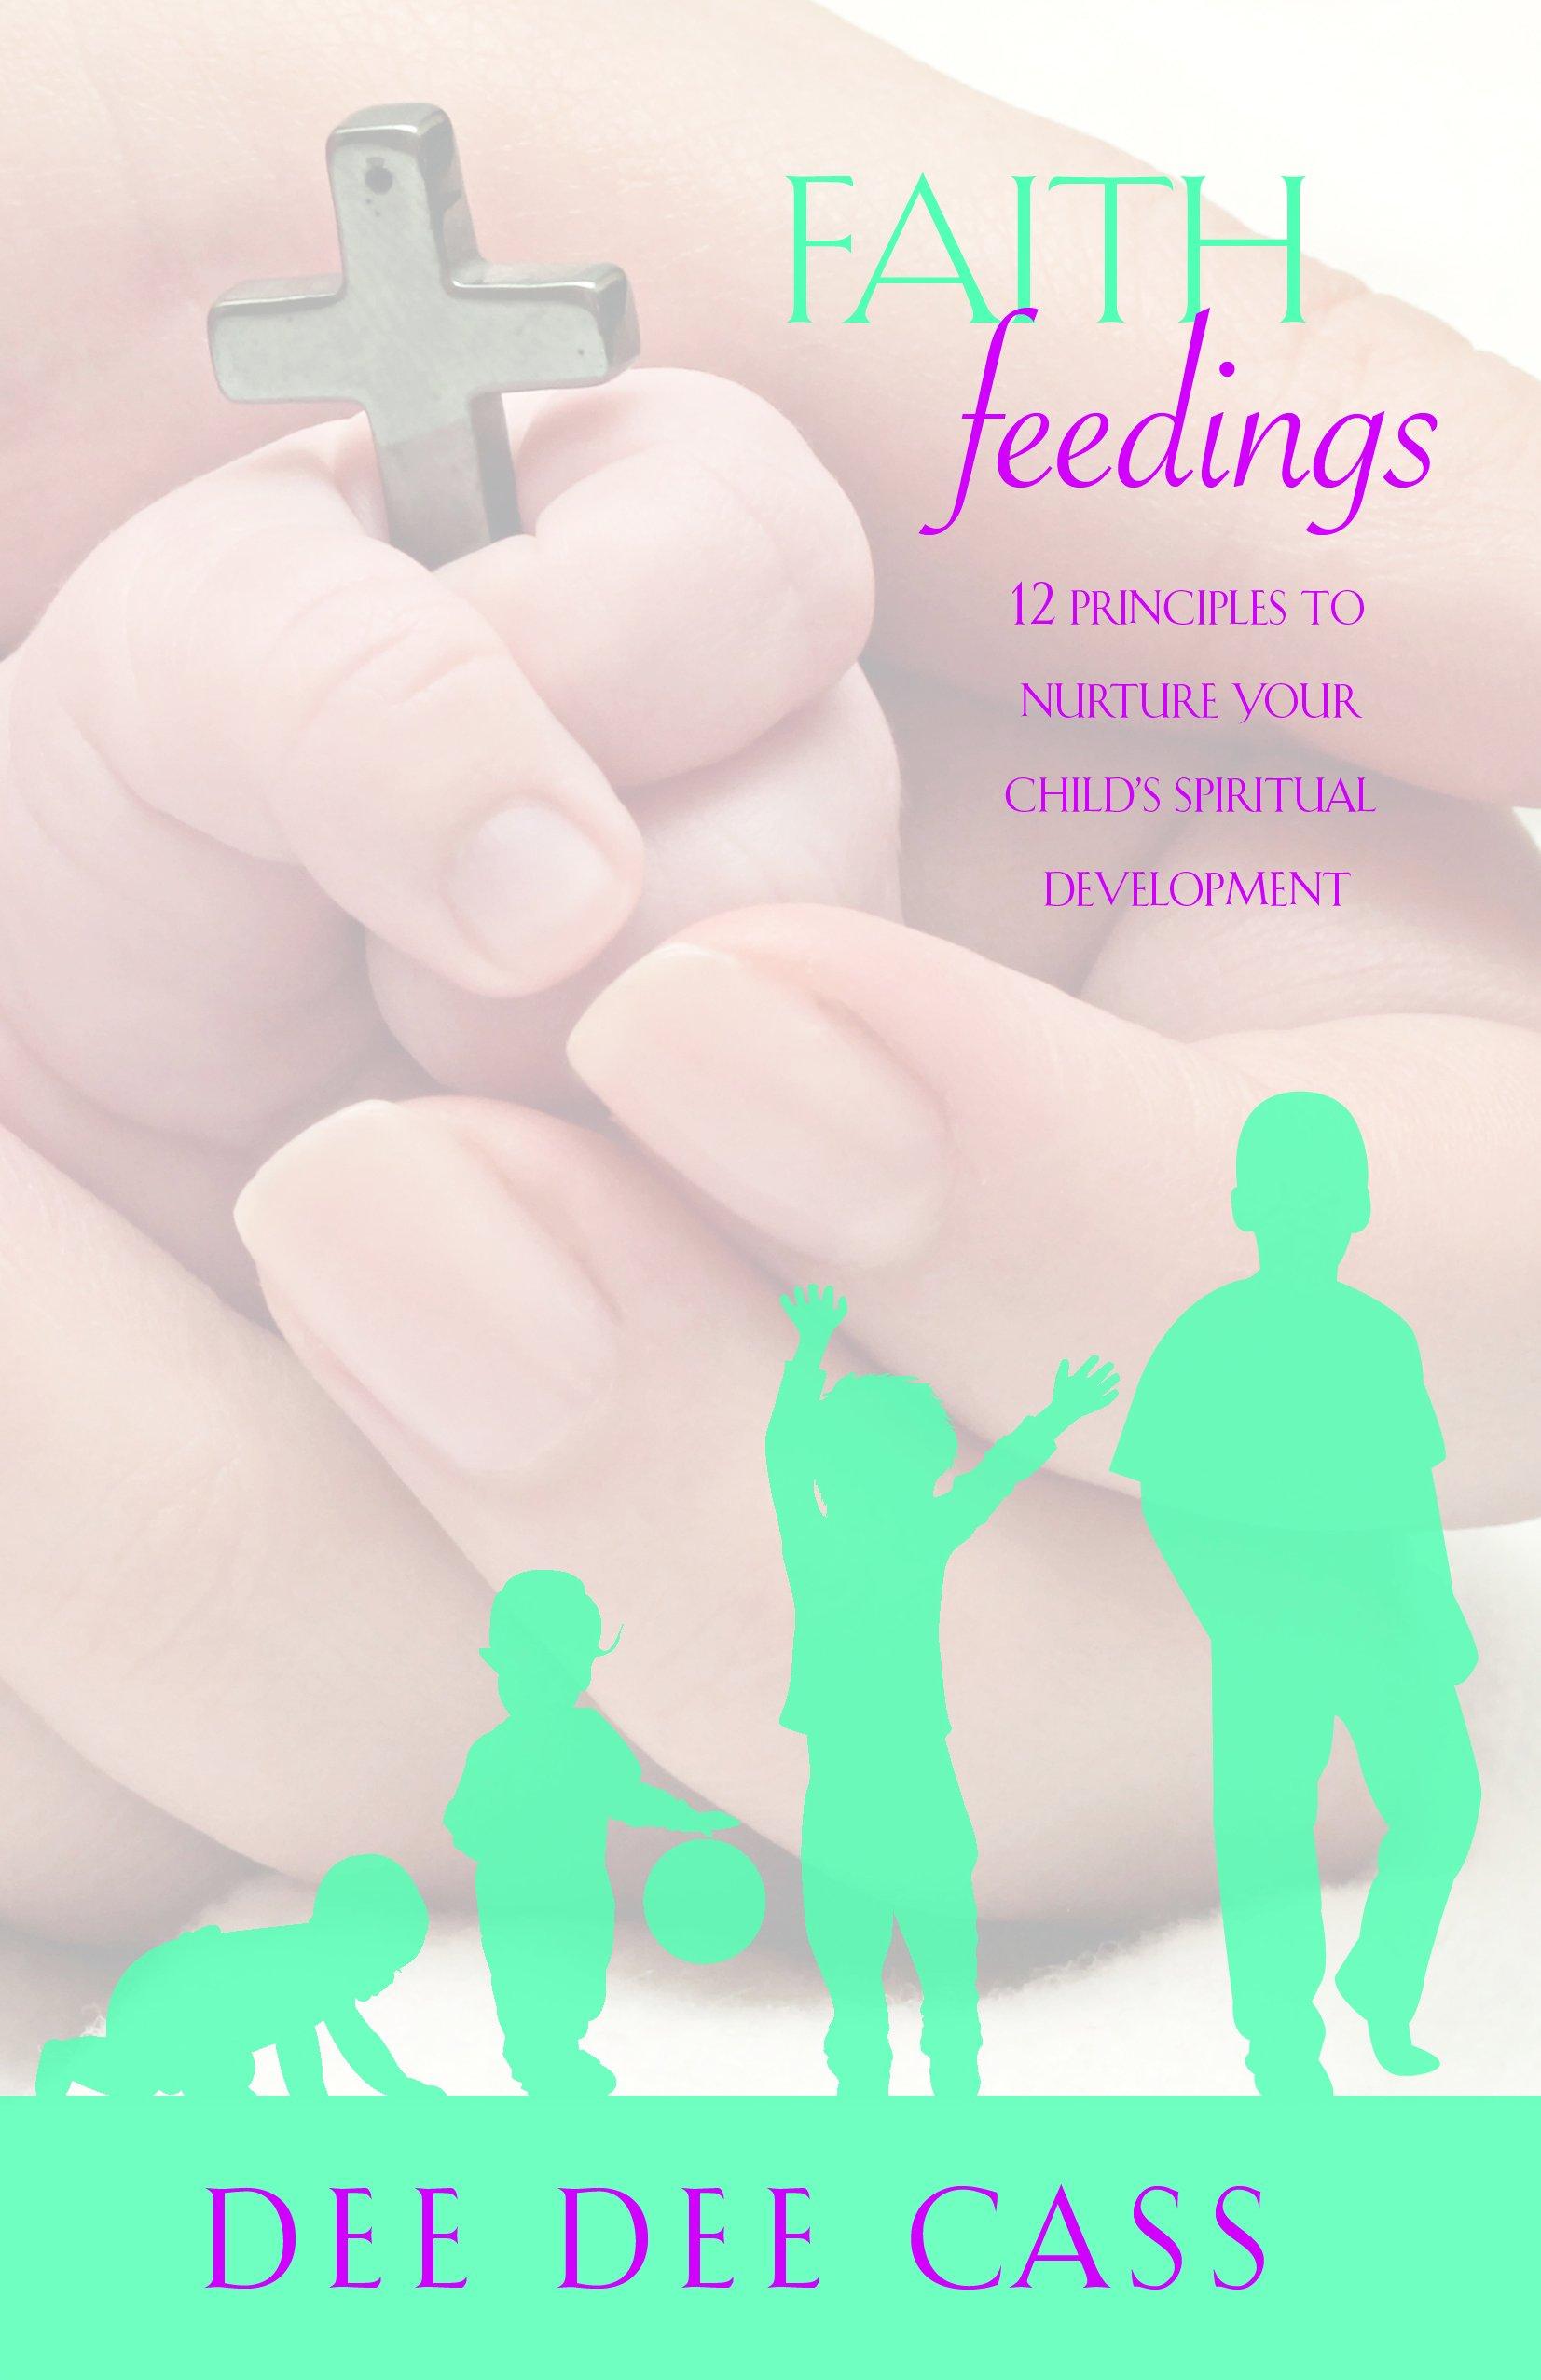 Download Faith Feedings: 12 Principles to Nurture Your Child's Spiritual Development ebook